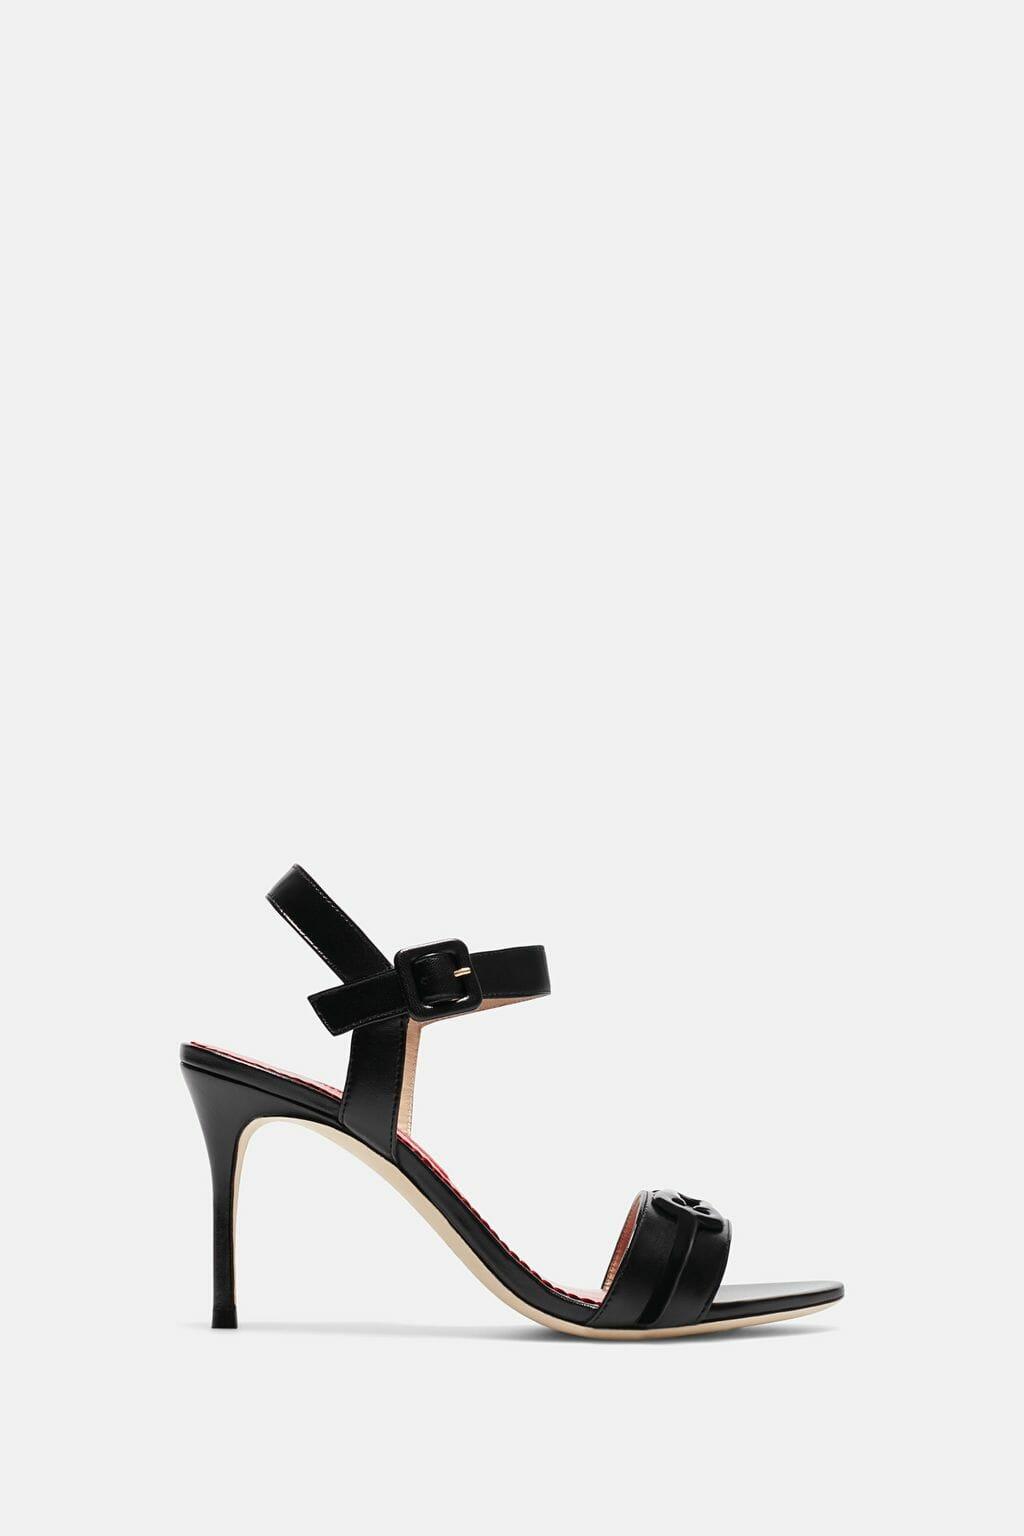 CH-Carolina-herrera-shoes-collection-Spring-Summer-2018-shoe-34